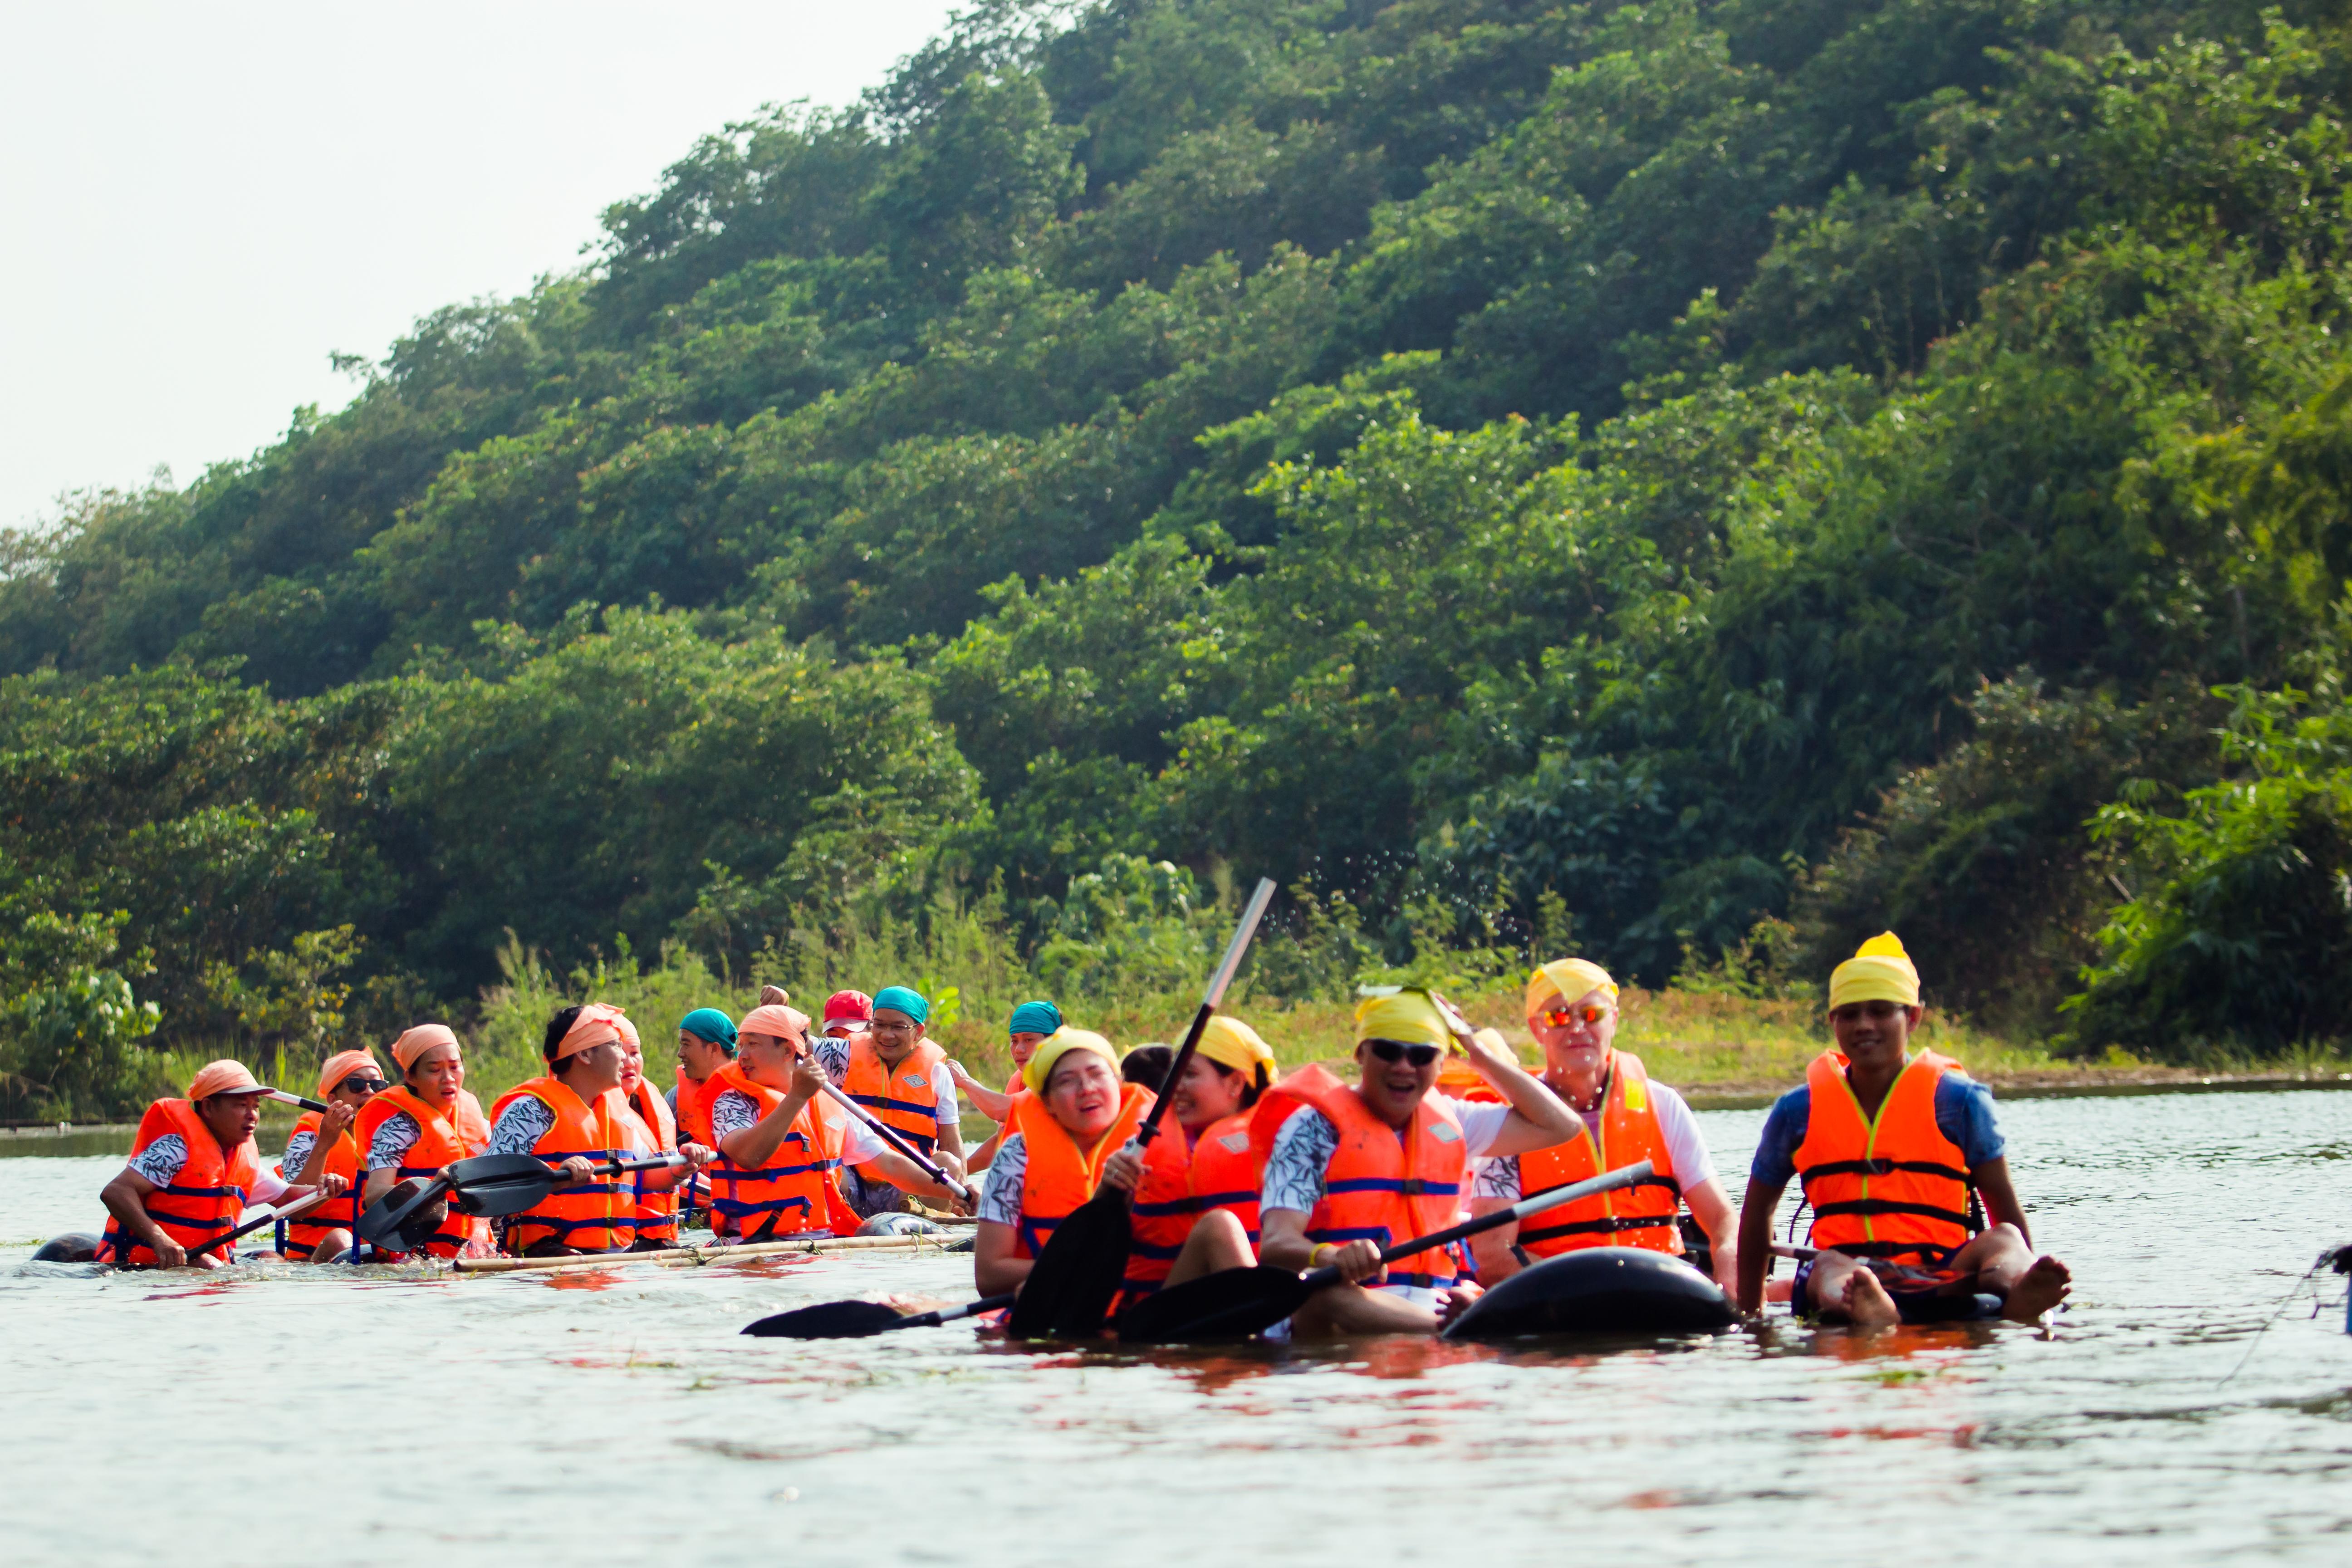 Bamboo raft building